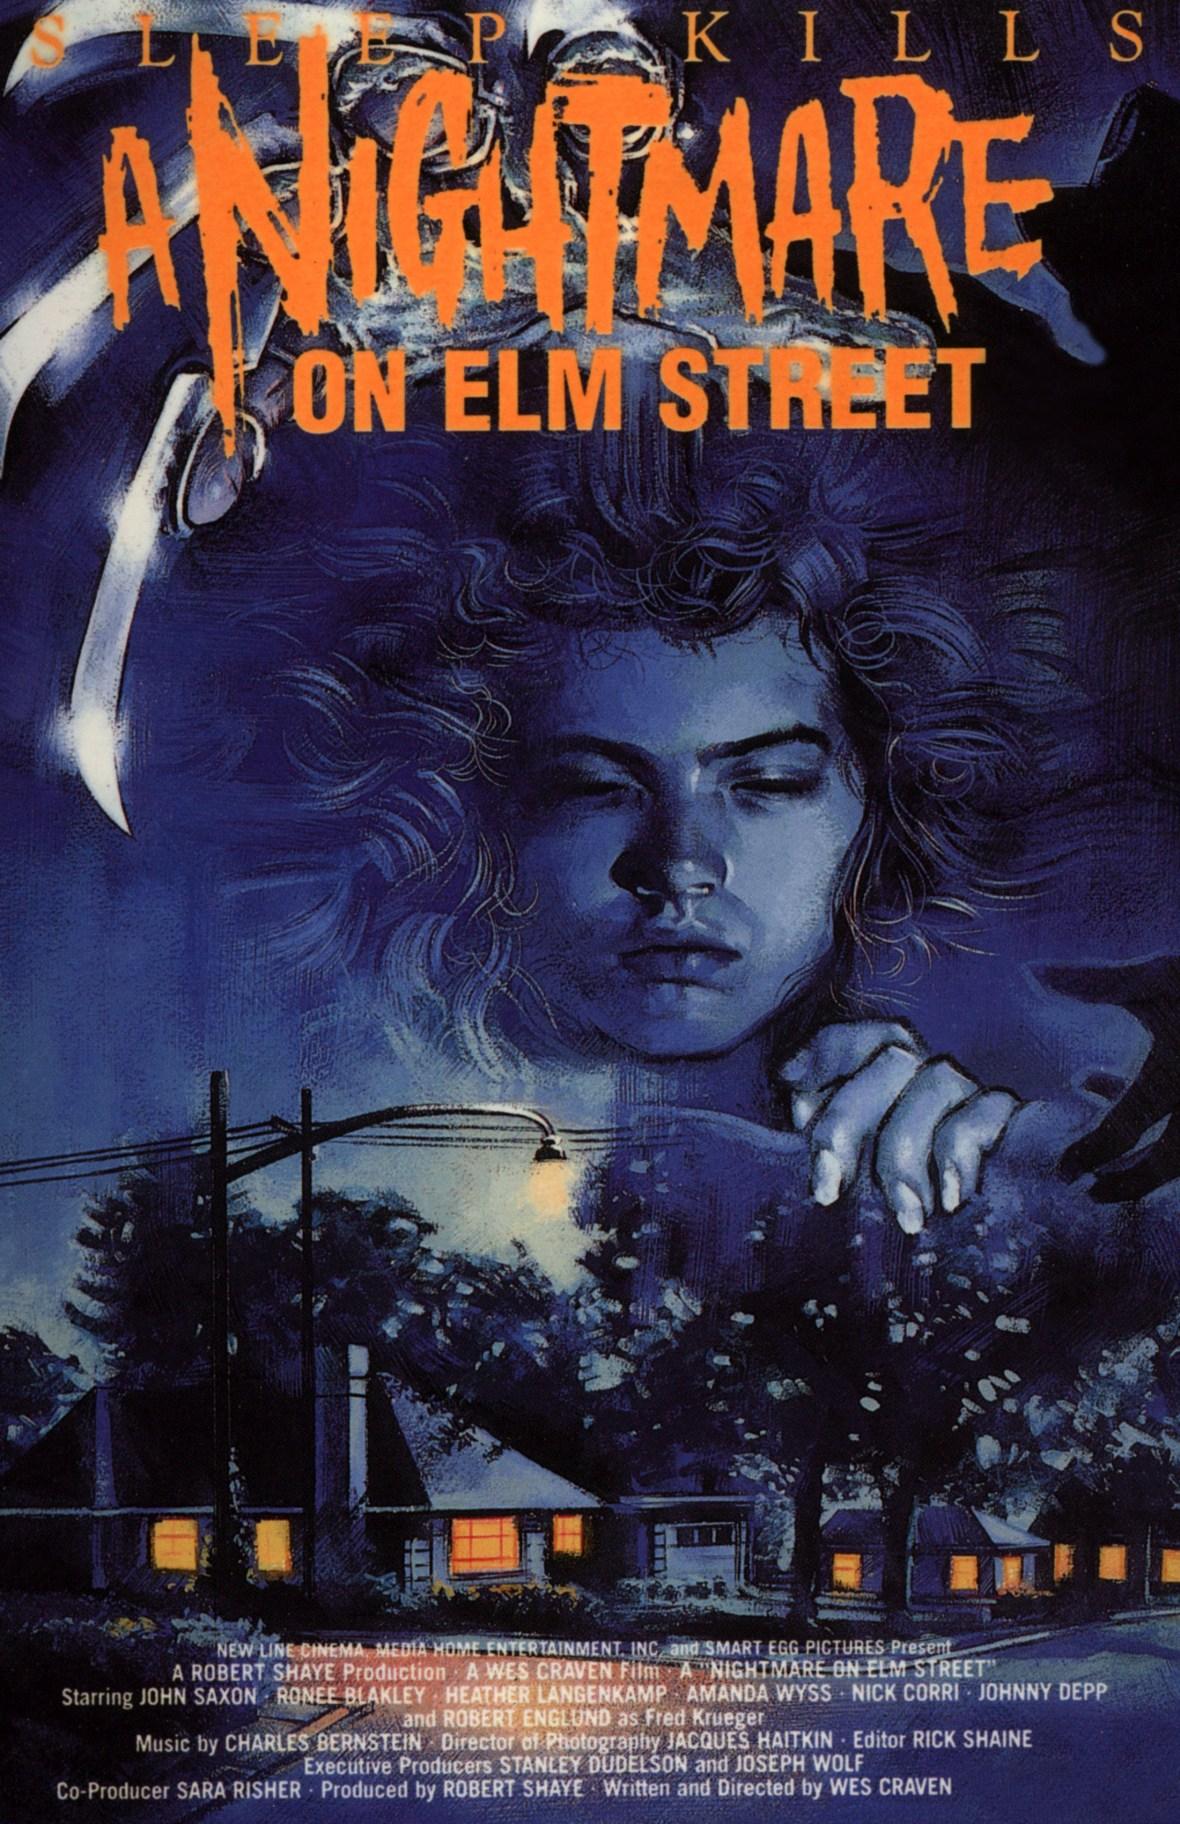 'A Nightmare on Elm Street' Movie Poster